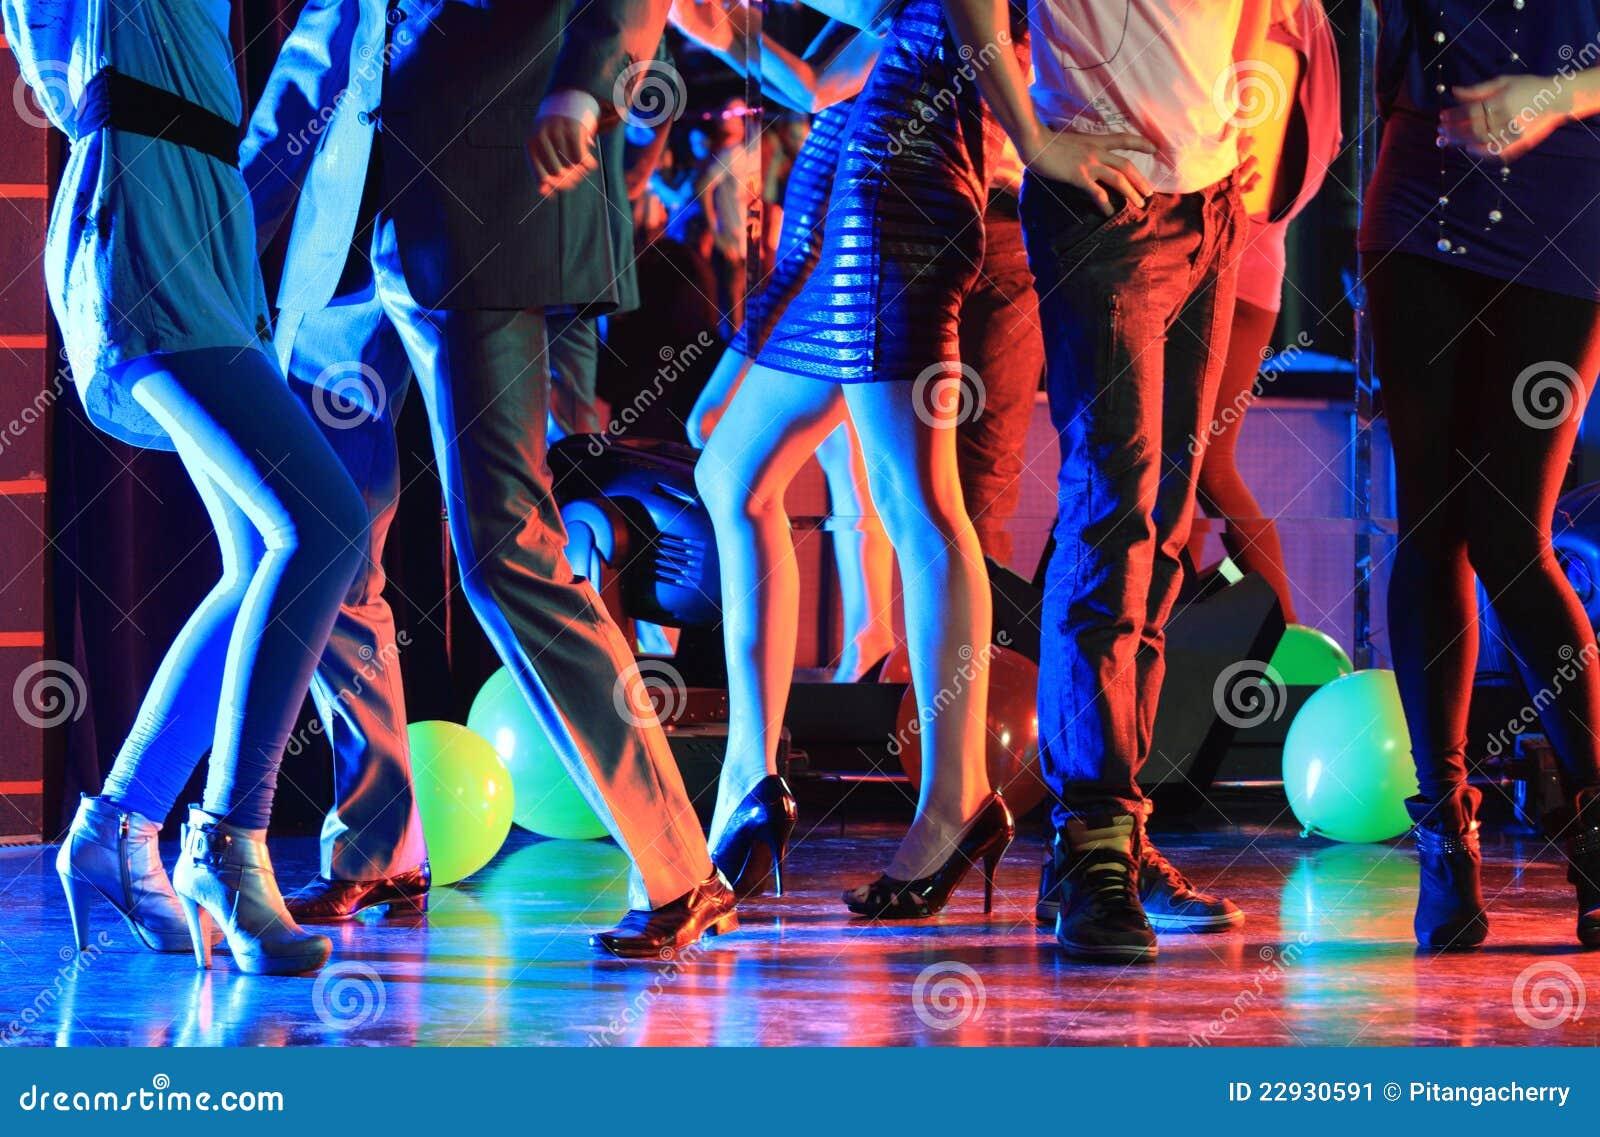 Night club party